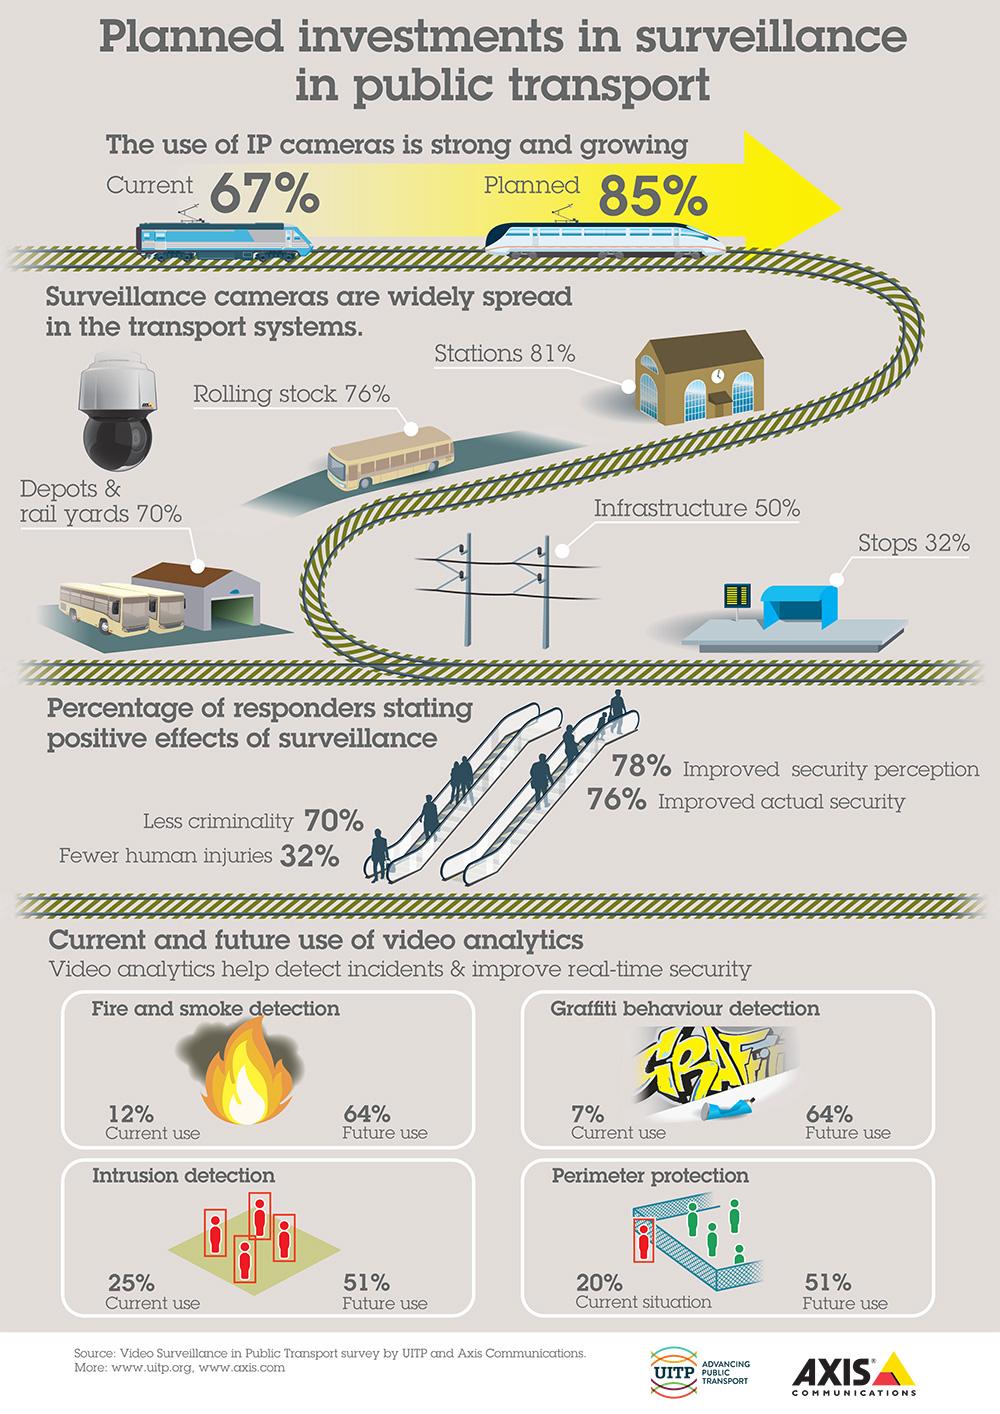 infographic public transportation UITP public transport axis communications  at cita.asia